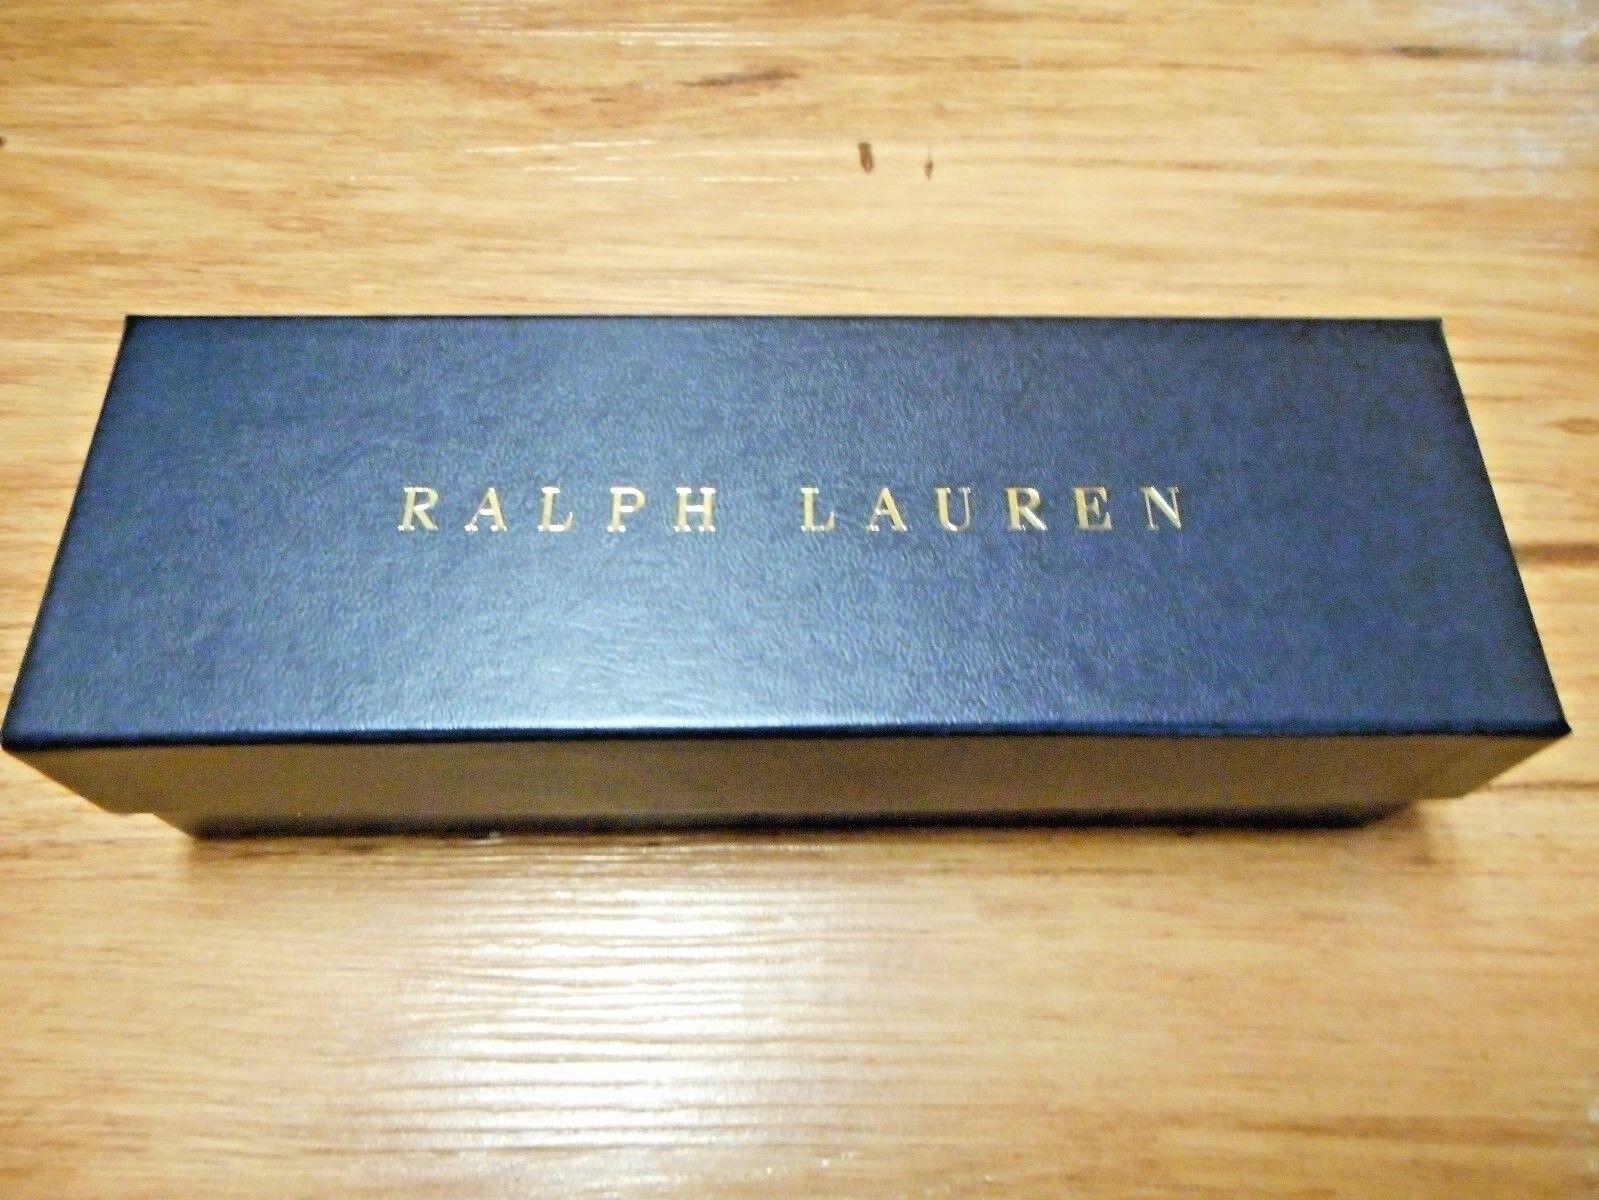 RALPH LAUREN CRYSTAL METROPOLIS SHOT GLASS SET OF 4 NEW IN BOX SET # 3